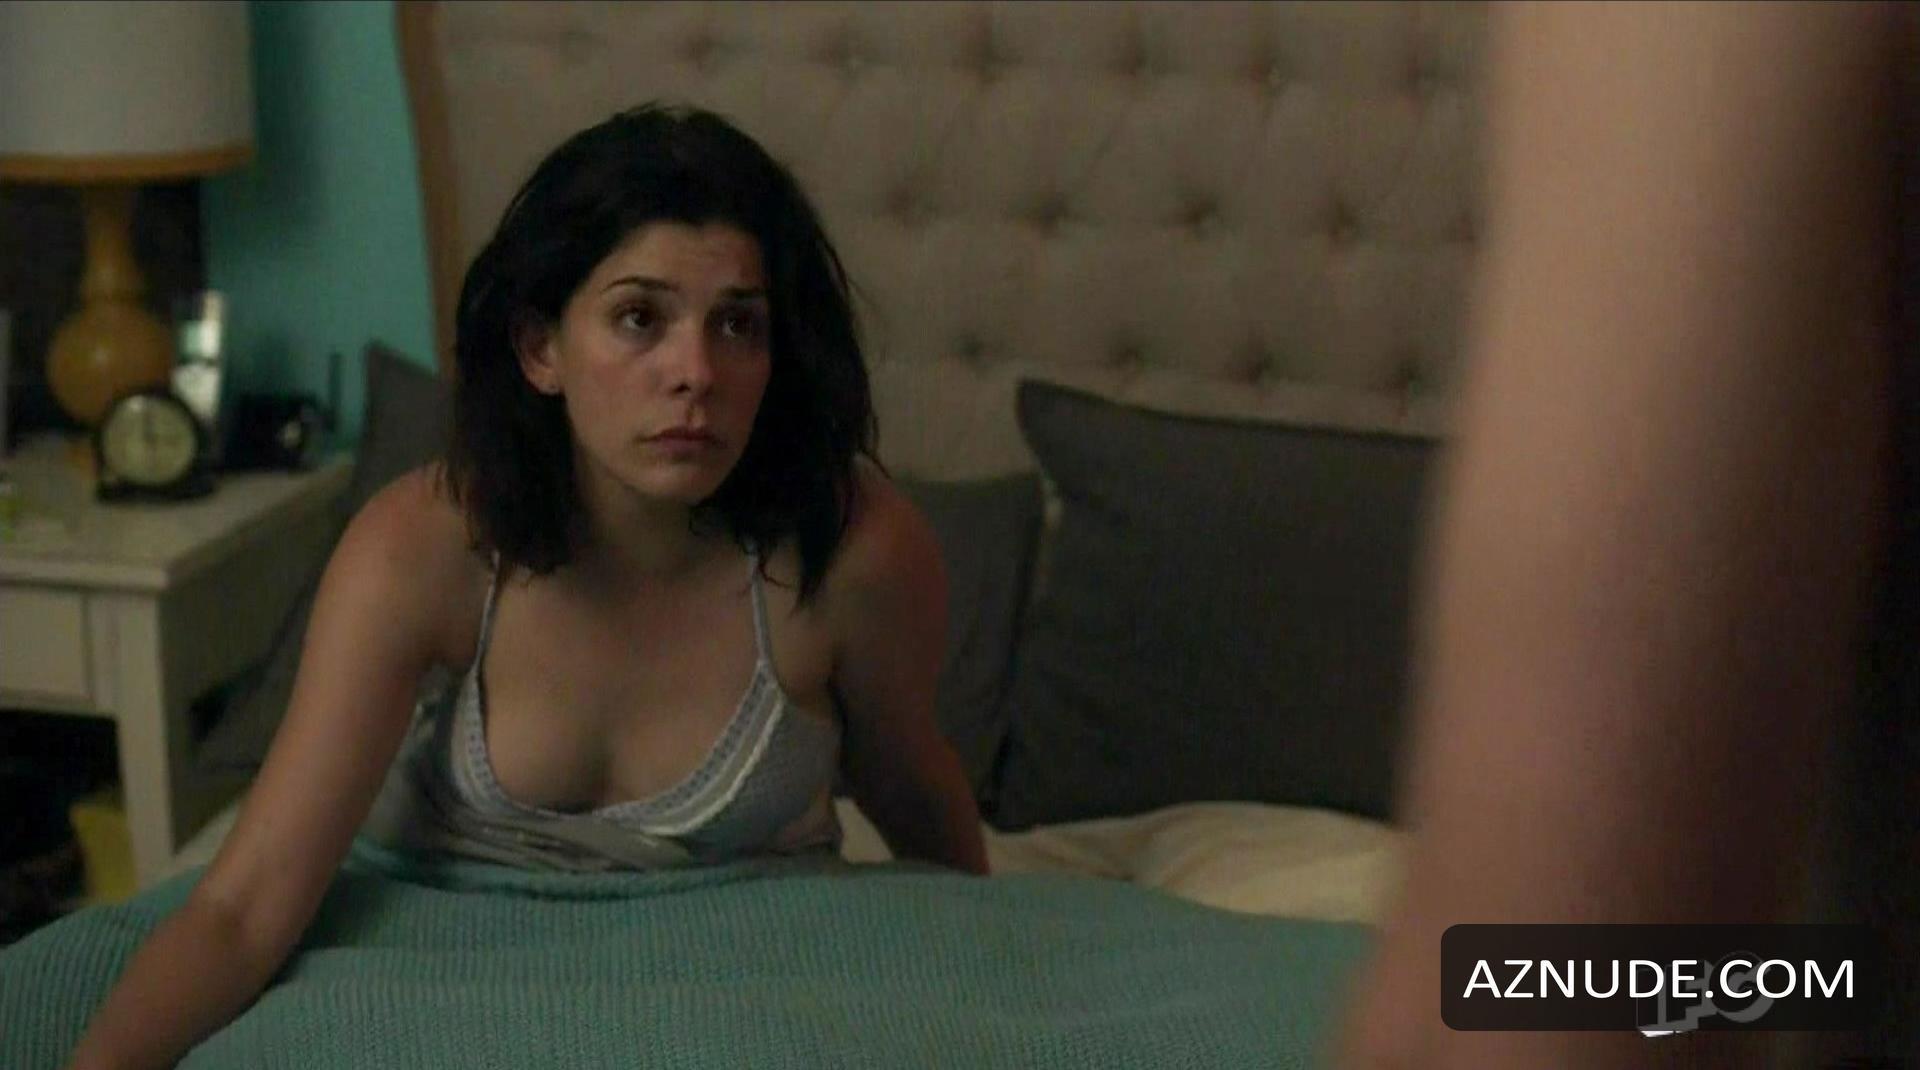 danny phantom boobs and pussy